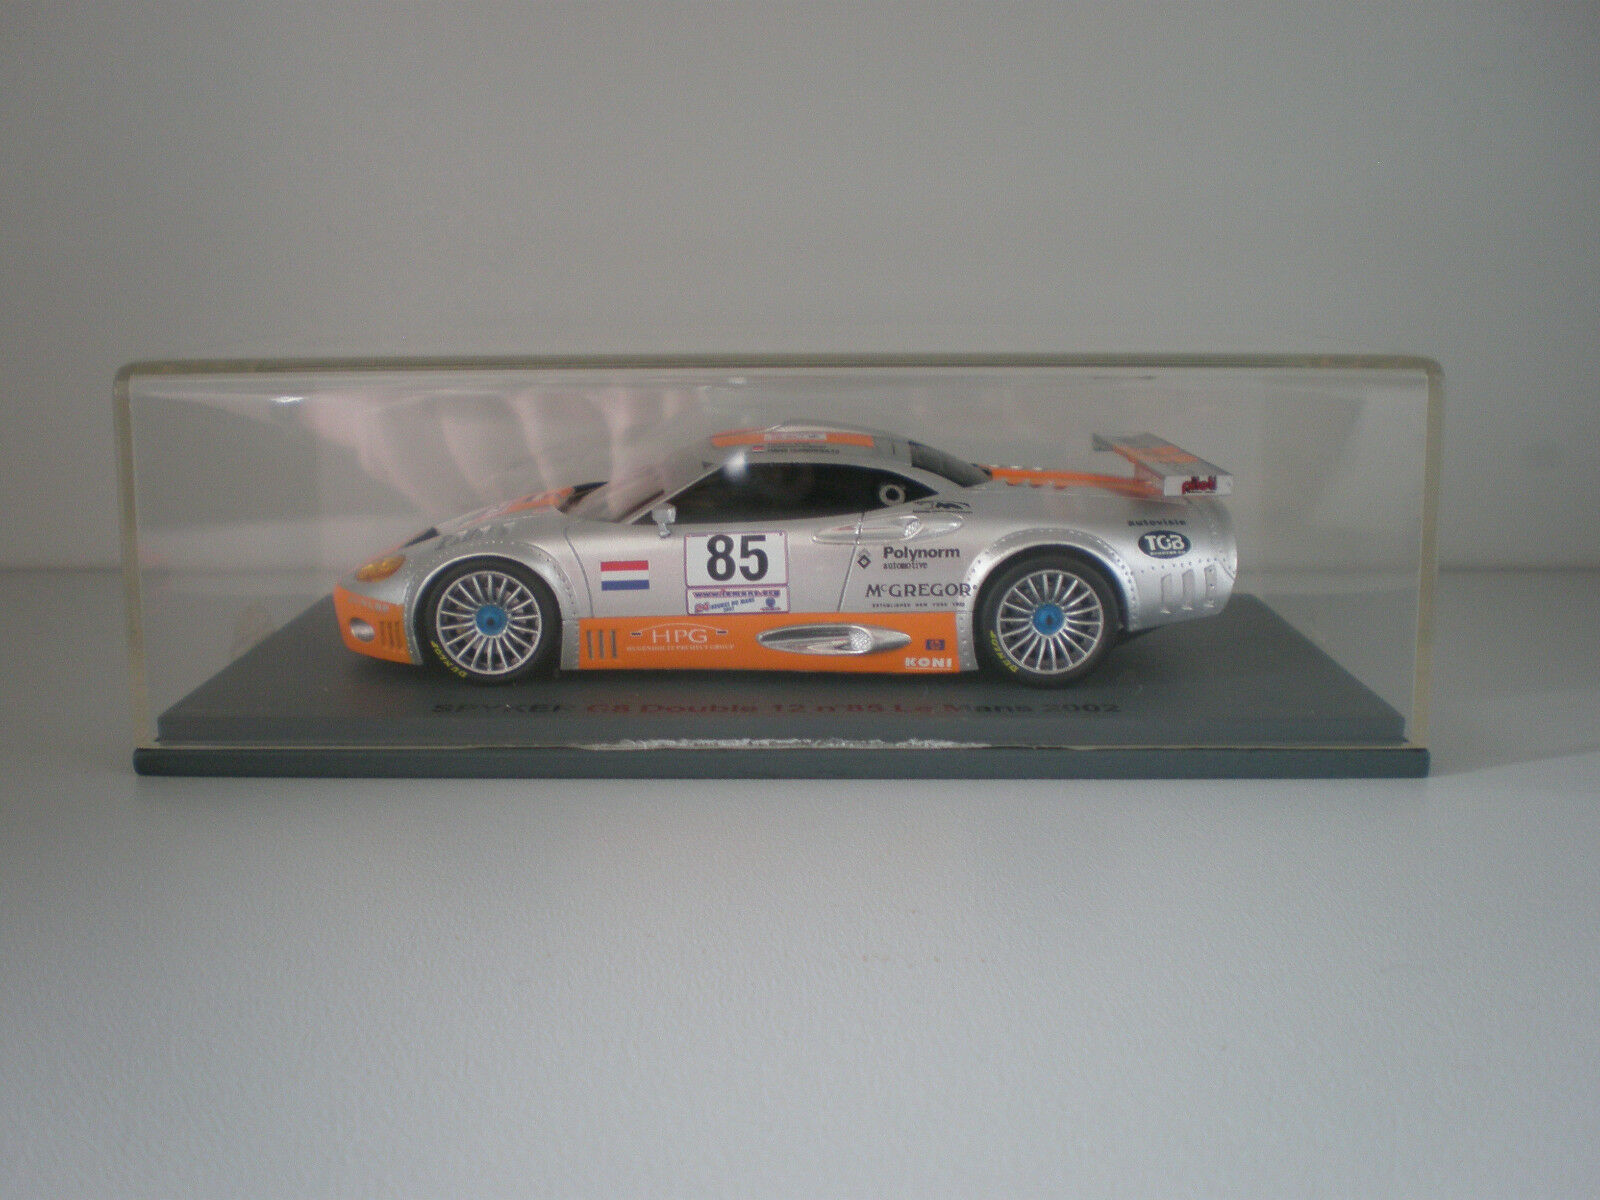 REPSPY04 Spyker C8 Double 12 R  85 Le Mans 2002 1 43  | Verbraucher zuerst